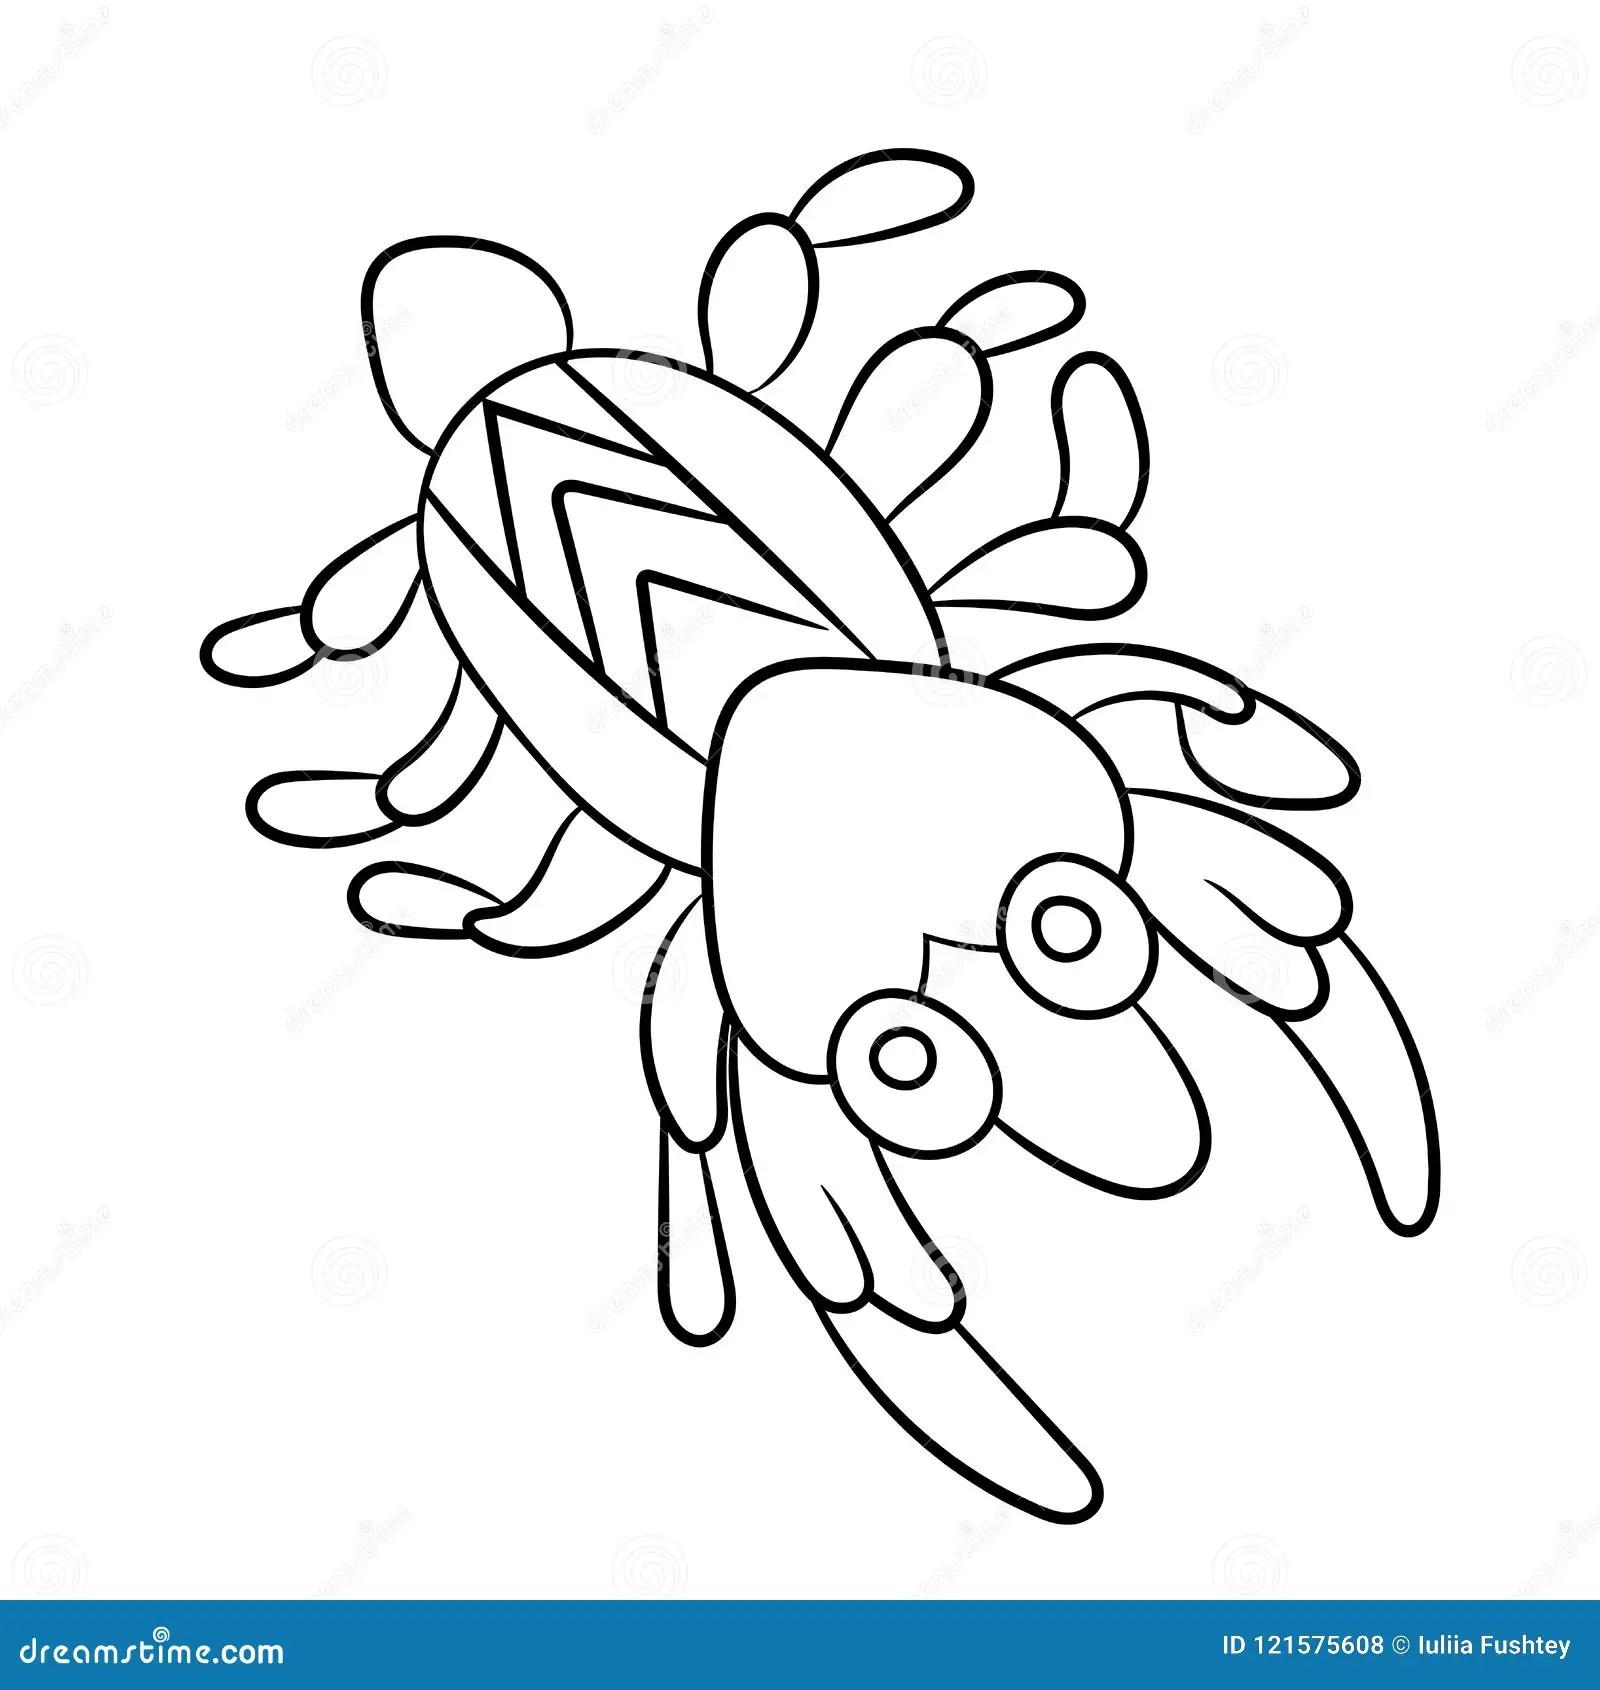 Shrimp Coloring Book. Small Marine Cancroid. Ocean